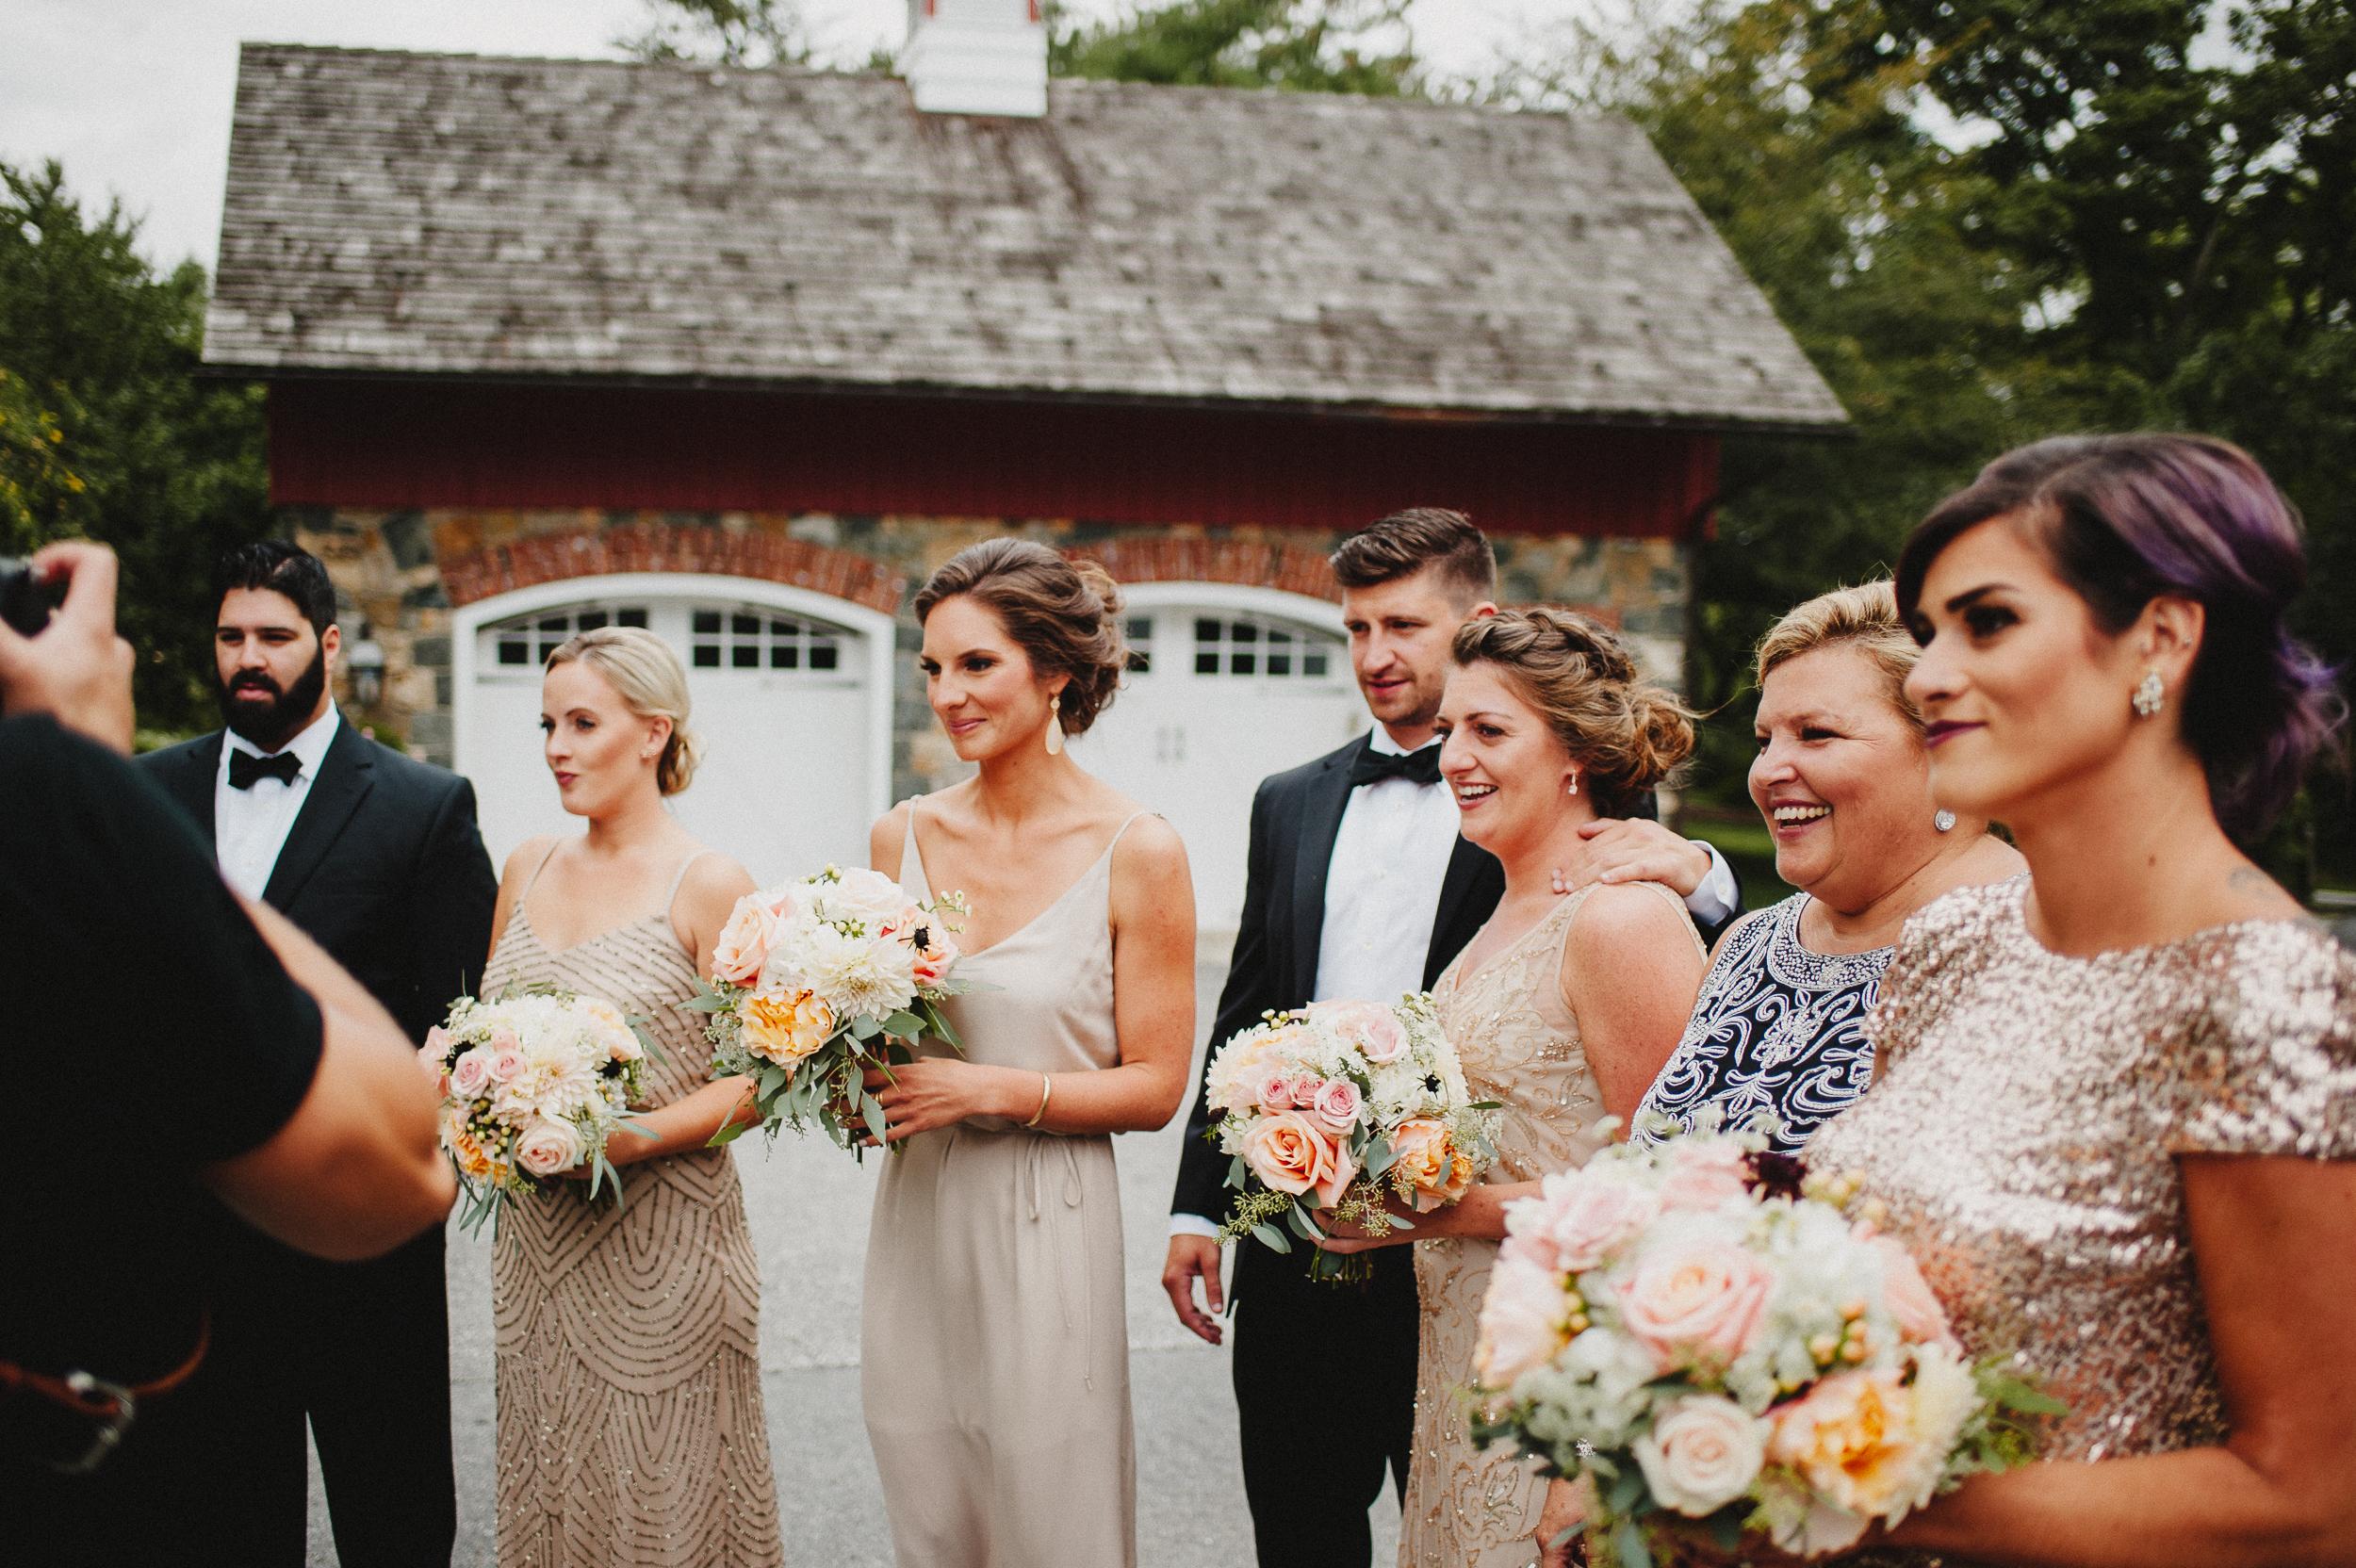 delaware-estate-wedding-photographer-pat-robinson-photography-43.jpg